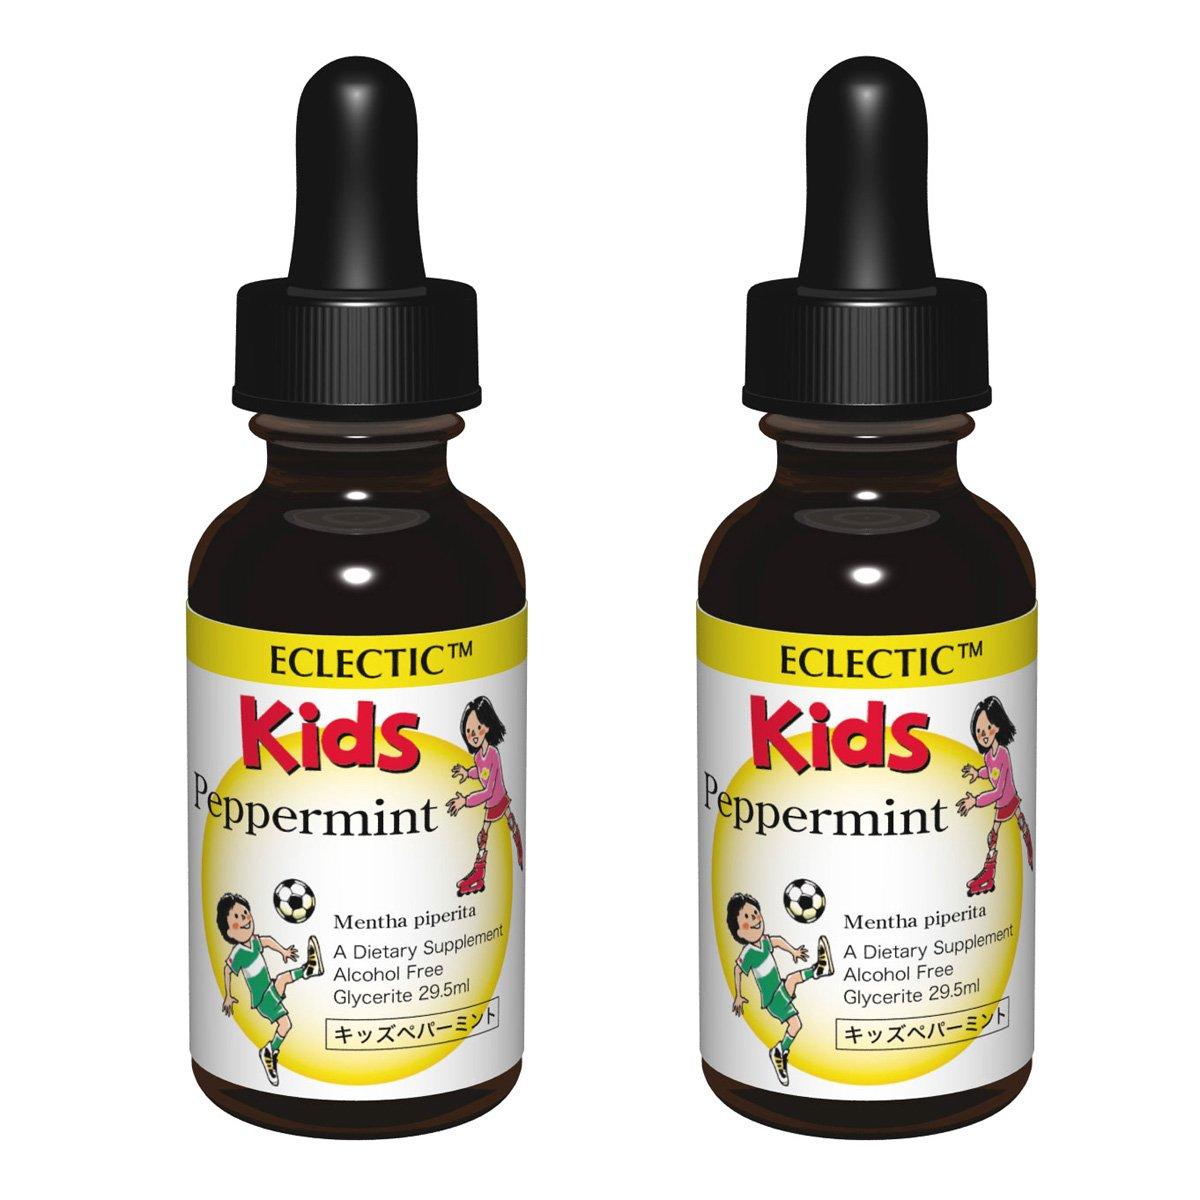 ECLECTIC kids エクレクティック キッズ ペパーミント チンキ 液体 1オンス 29.5ml 2個セット B01MRNICI4